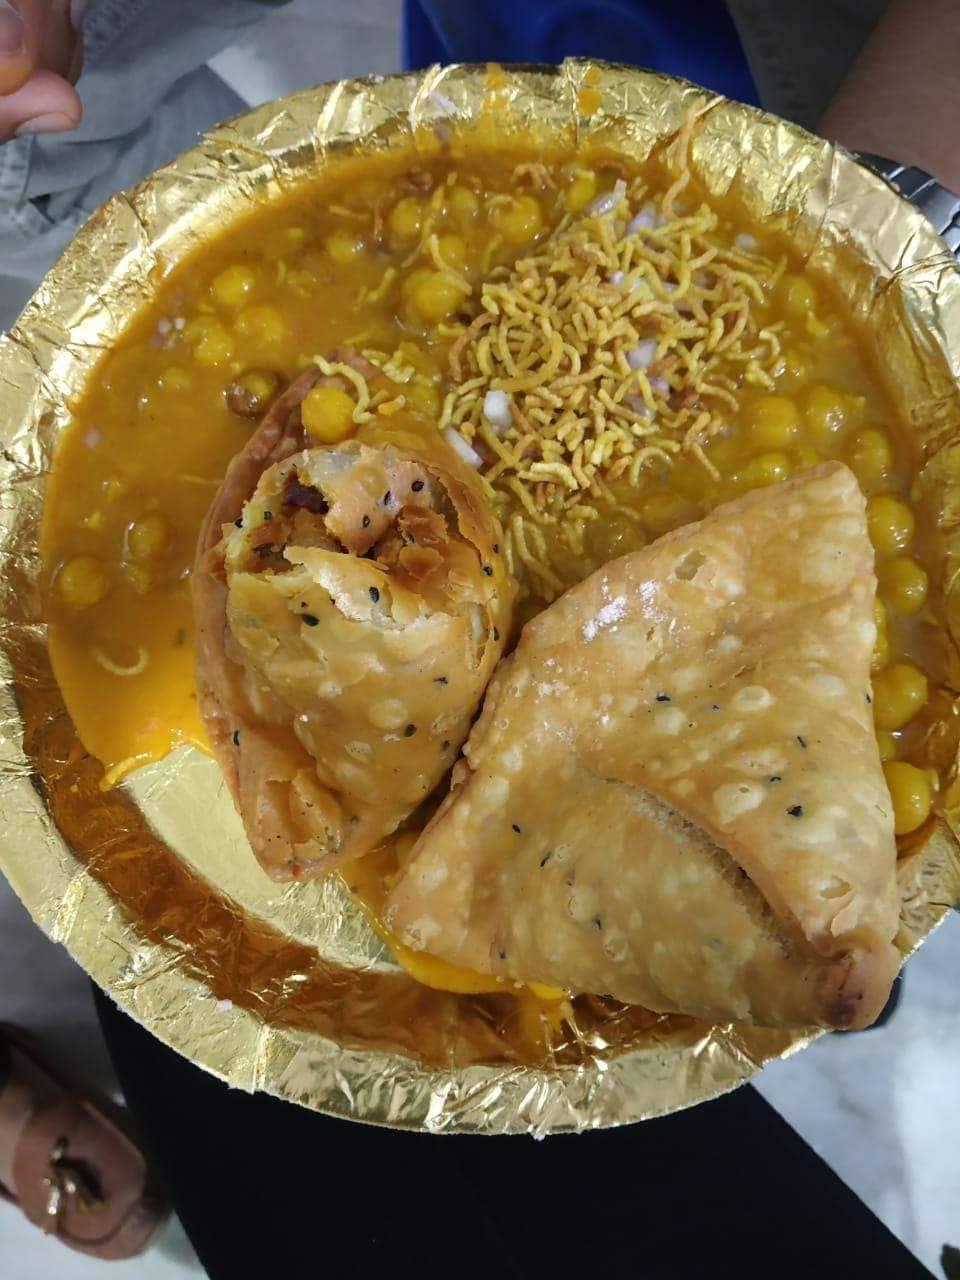 Odisha House Kondapur Hyderabad Zomato Gungi is a verb, noun, and an adjective. odisha house kondapur hyderabad zomato